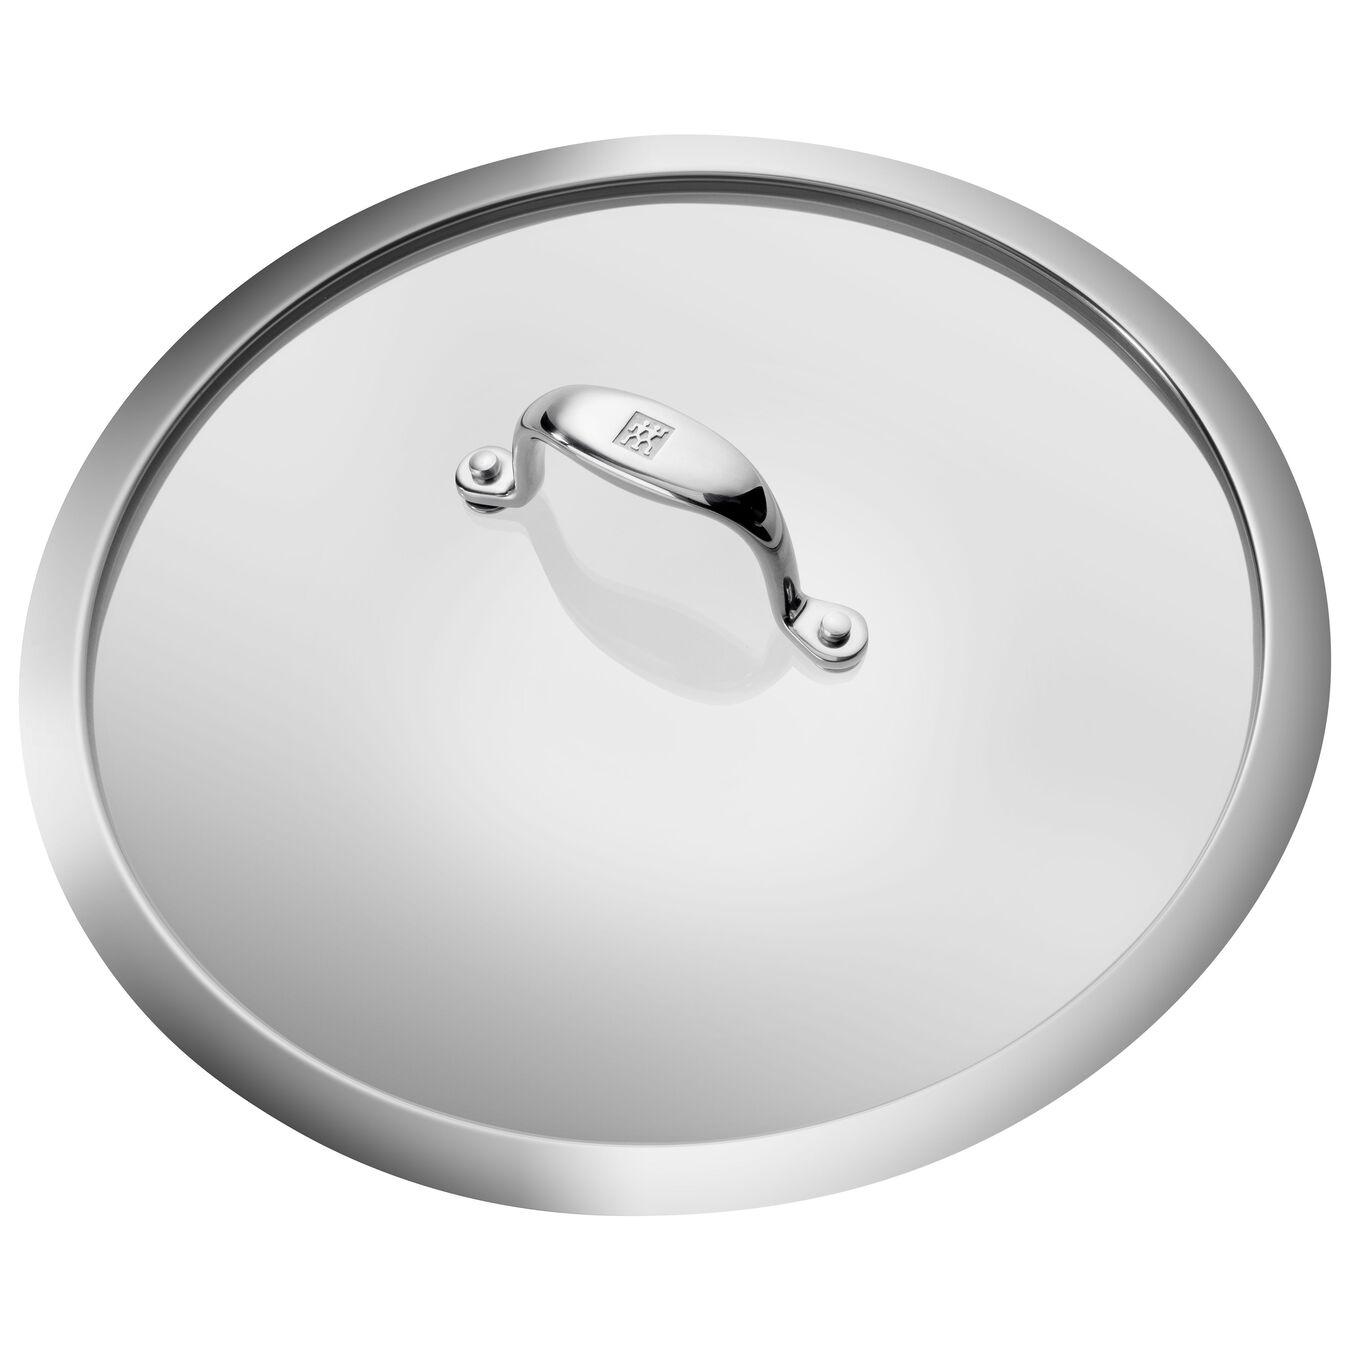 Derin Tencere | Alüminyum | 28 cm,,large 6